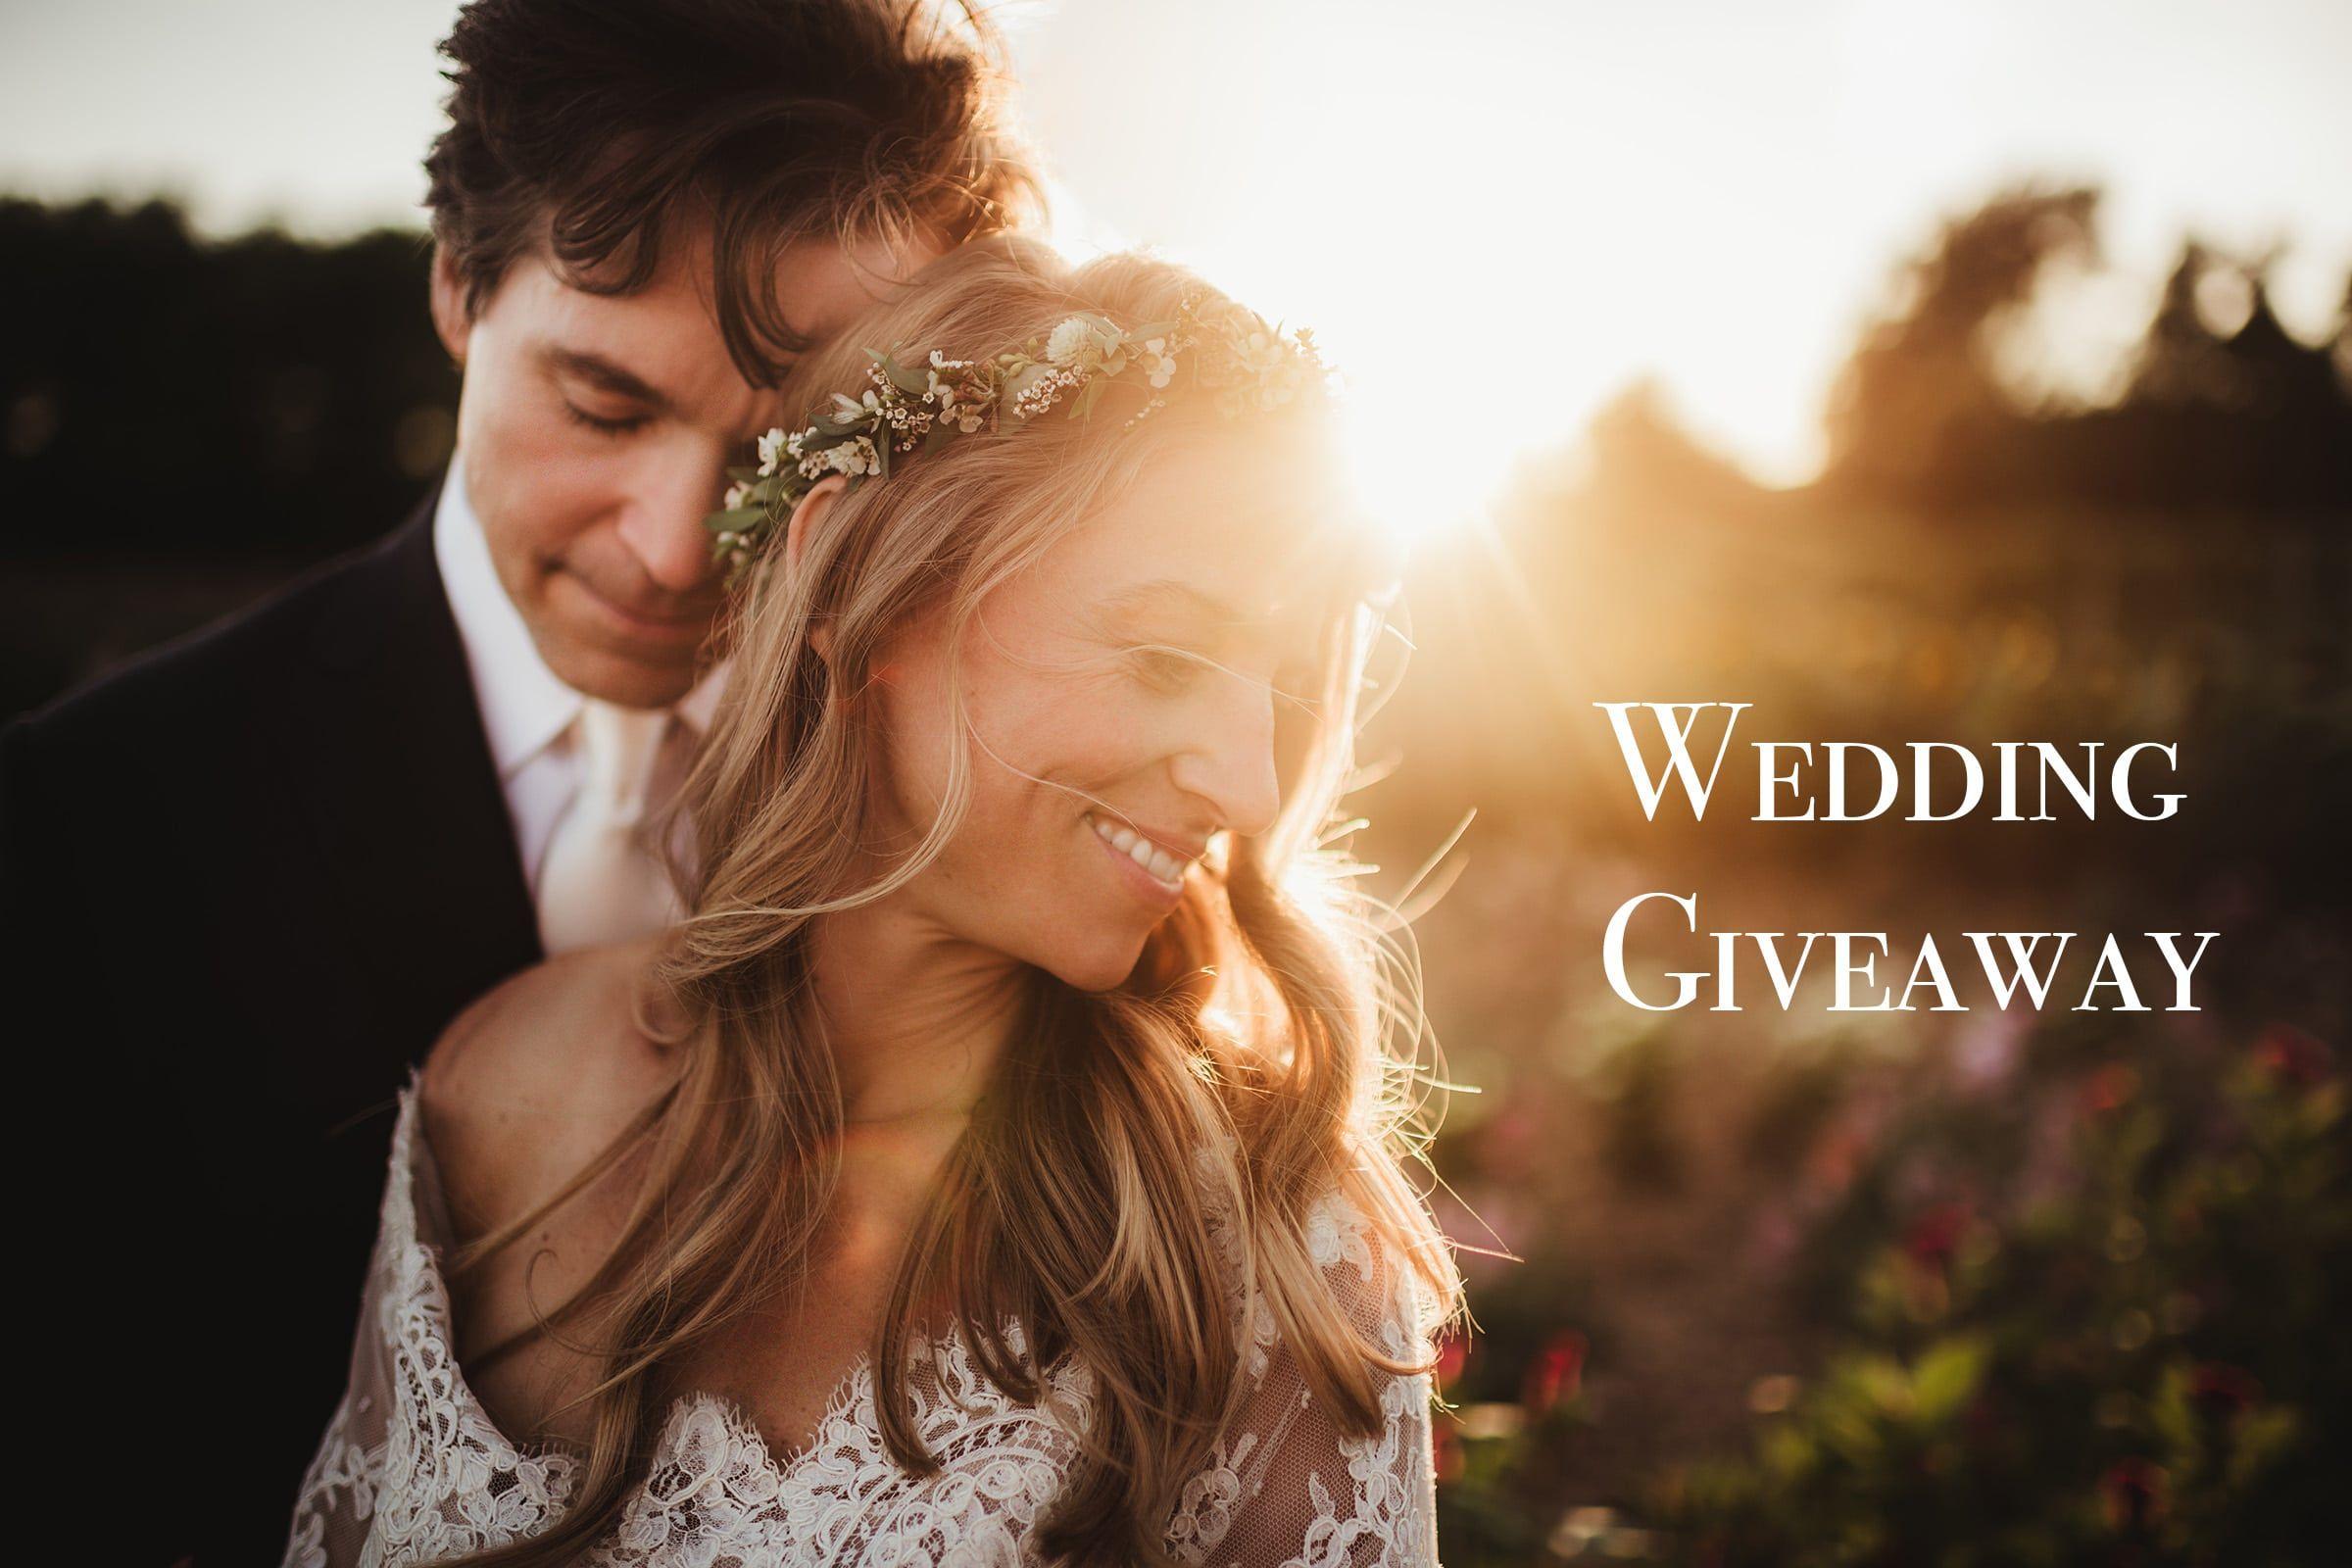 Wedding Giveaway Bride Groom Sunset